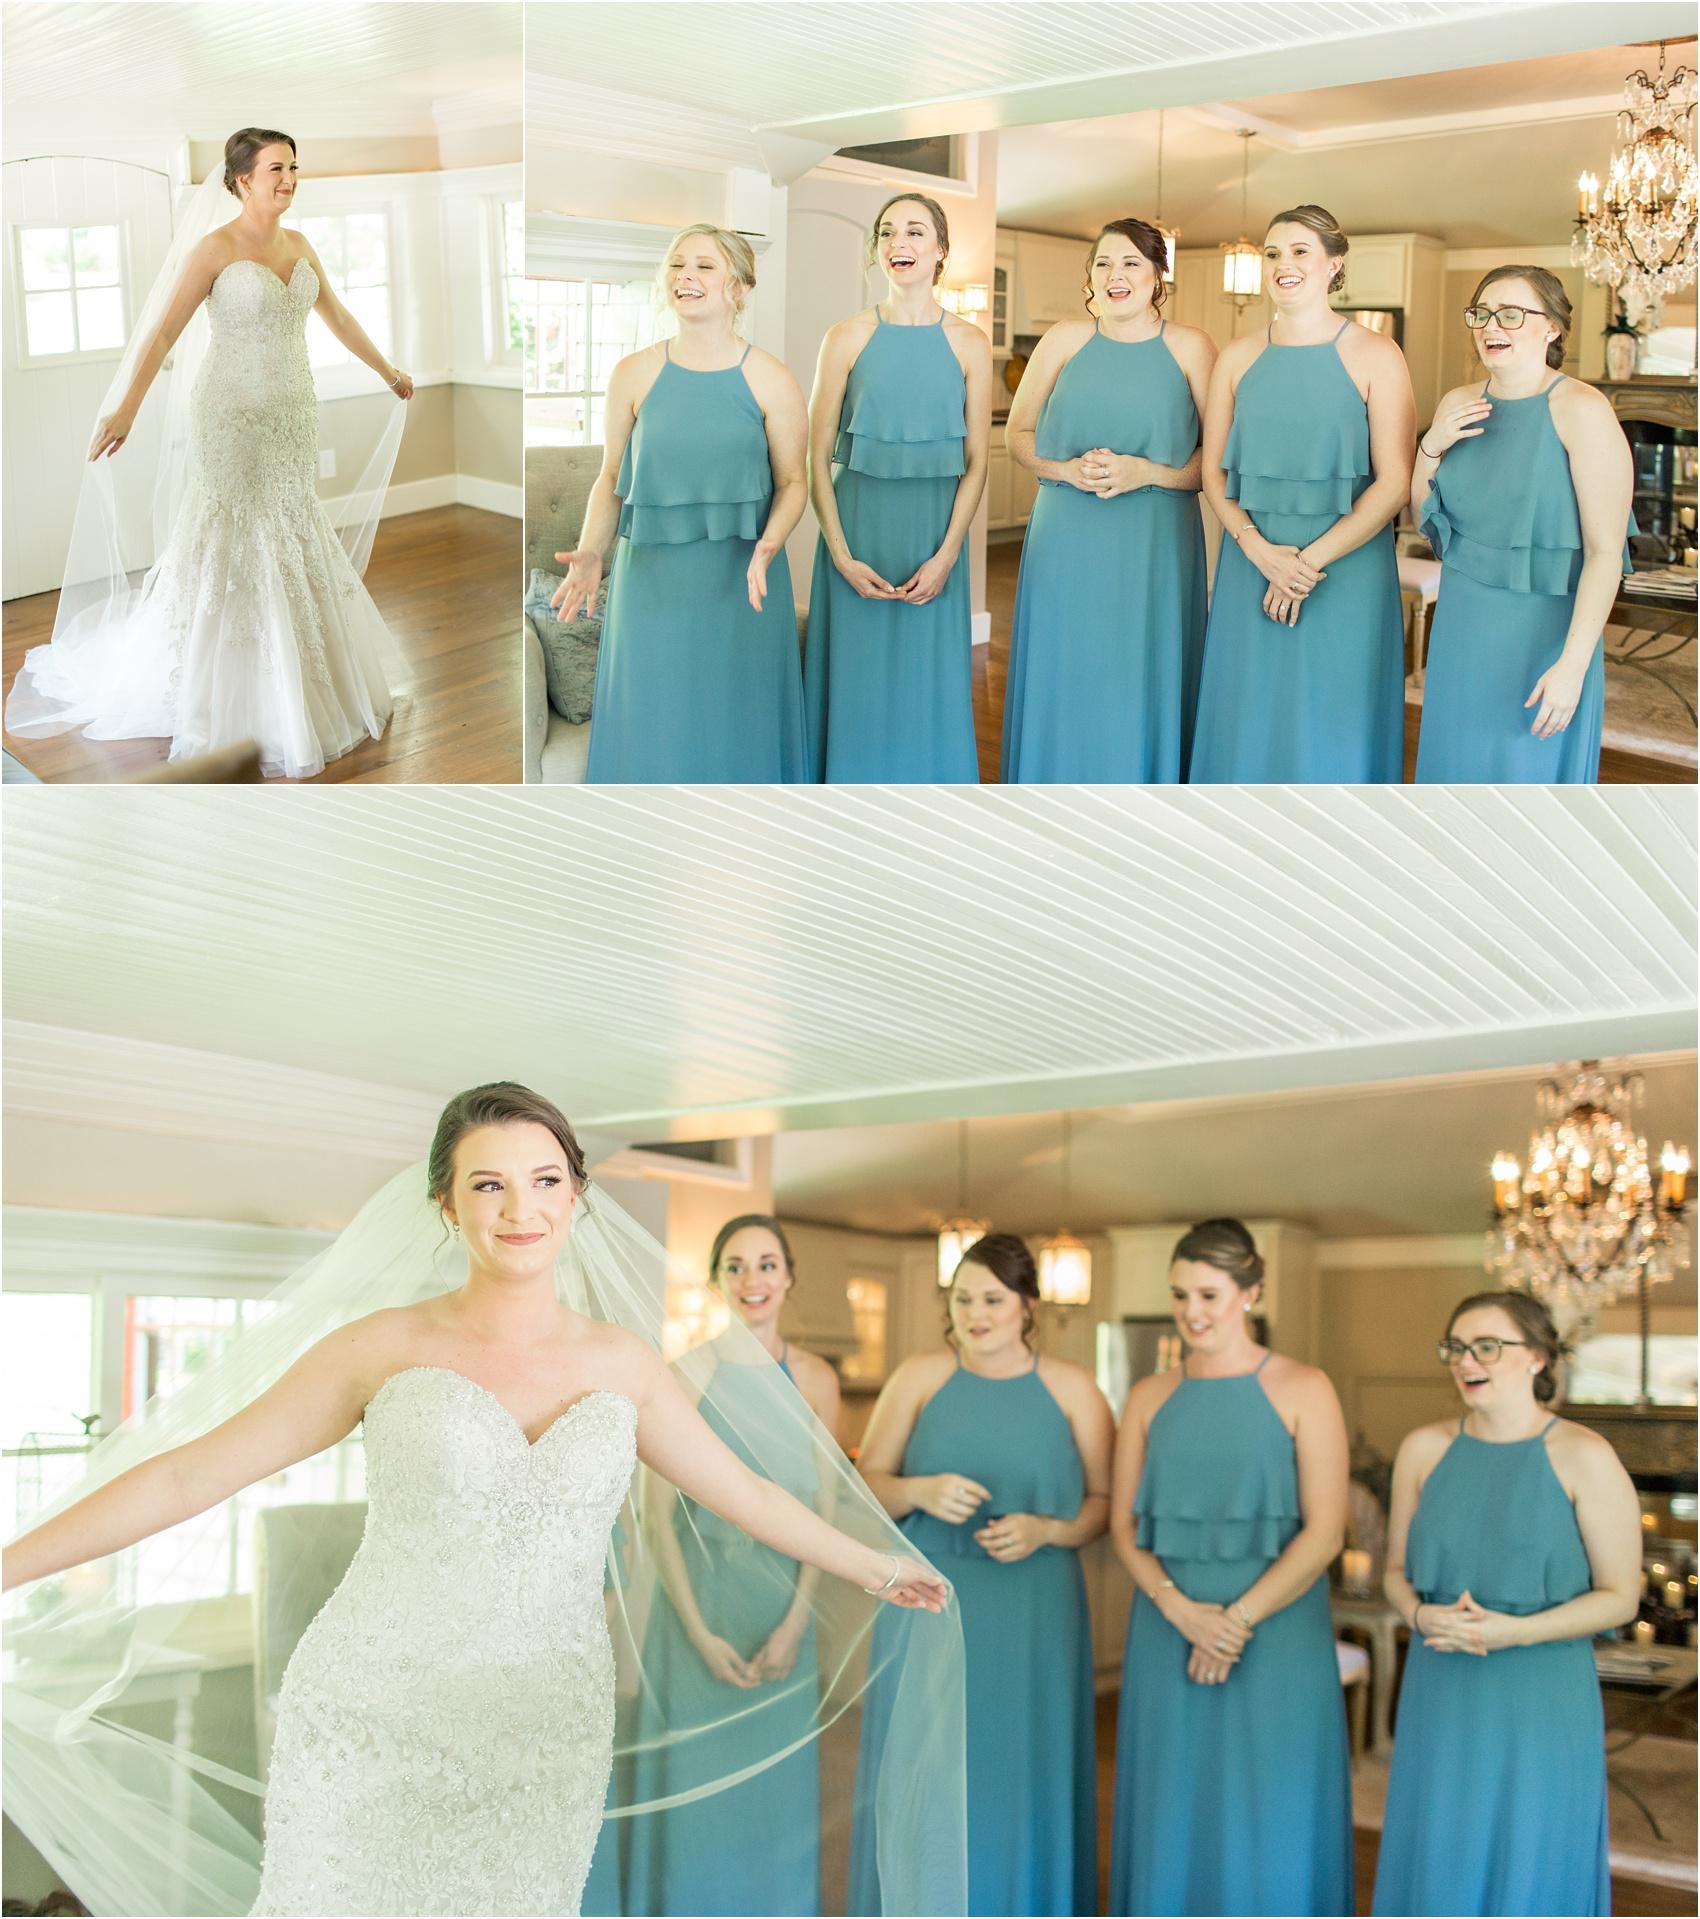 Savannah Eve Photography- Nutt Wedding- Blog-20.jpg